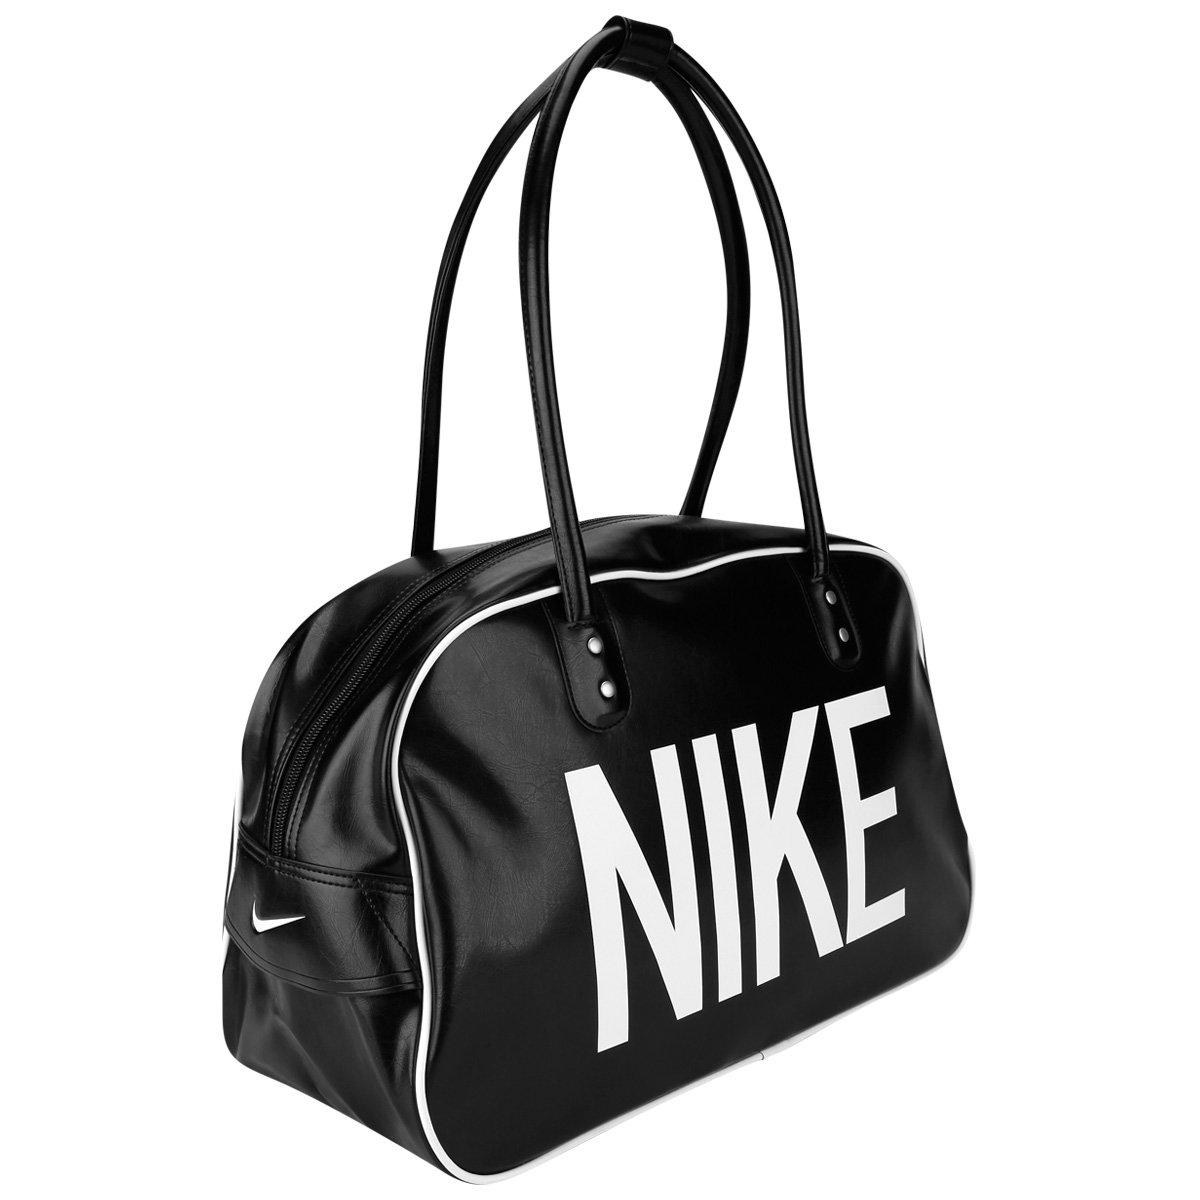 Nike Ad Bolsa Preto Heritage Club Shoulder Branco E edoQECxrBW